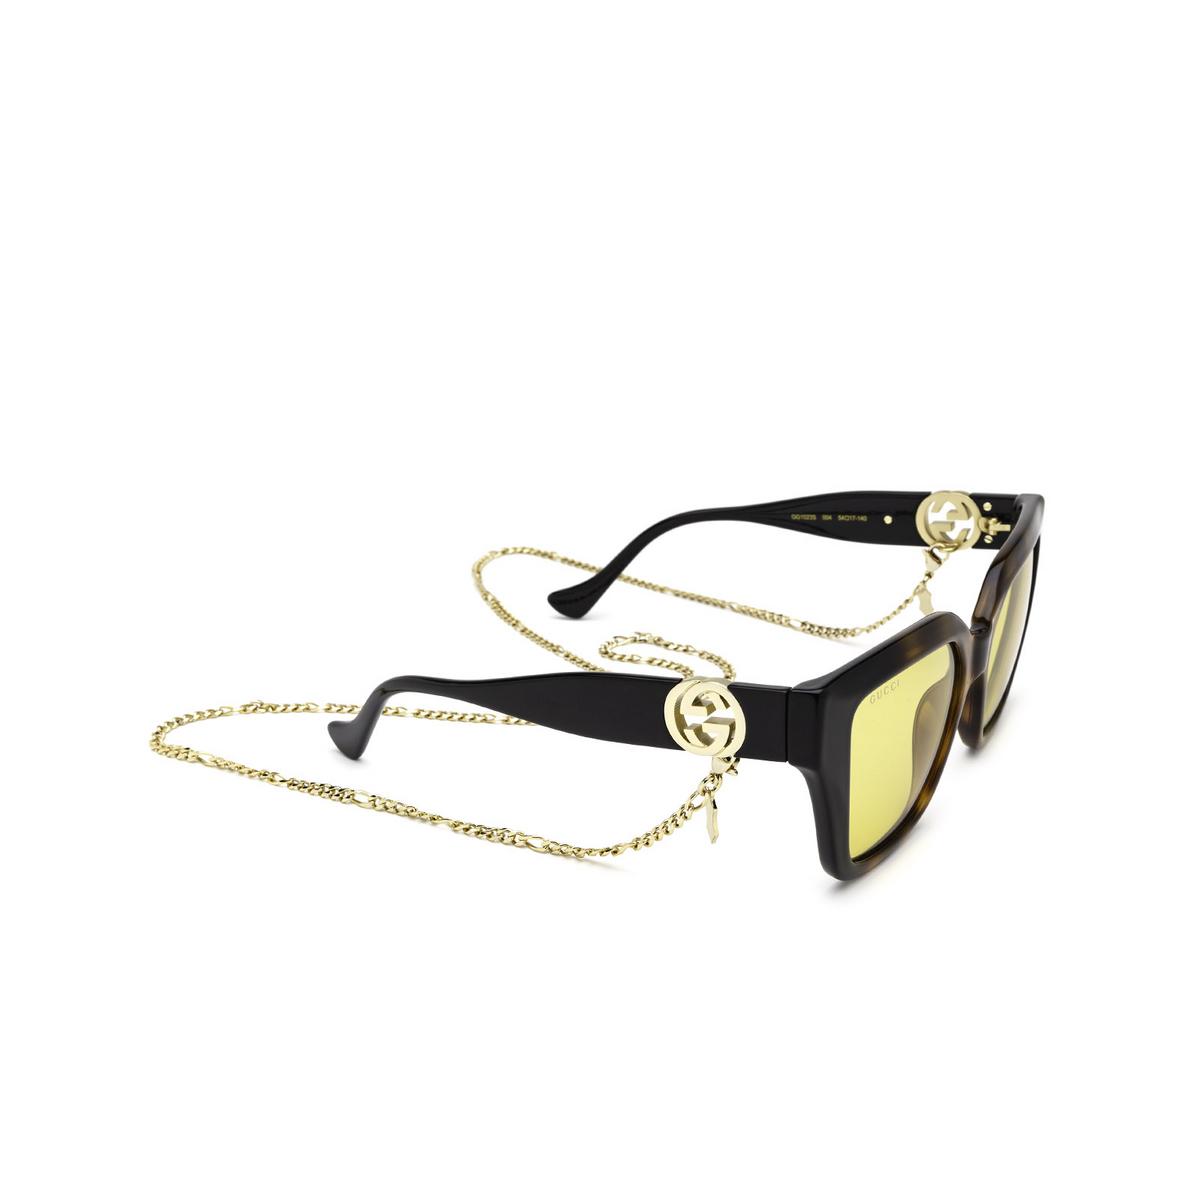 Gucci® Butterfly Sunglasses: GG1023S color Havana & Black 004 - three-quarters view.